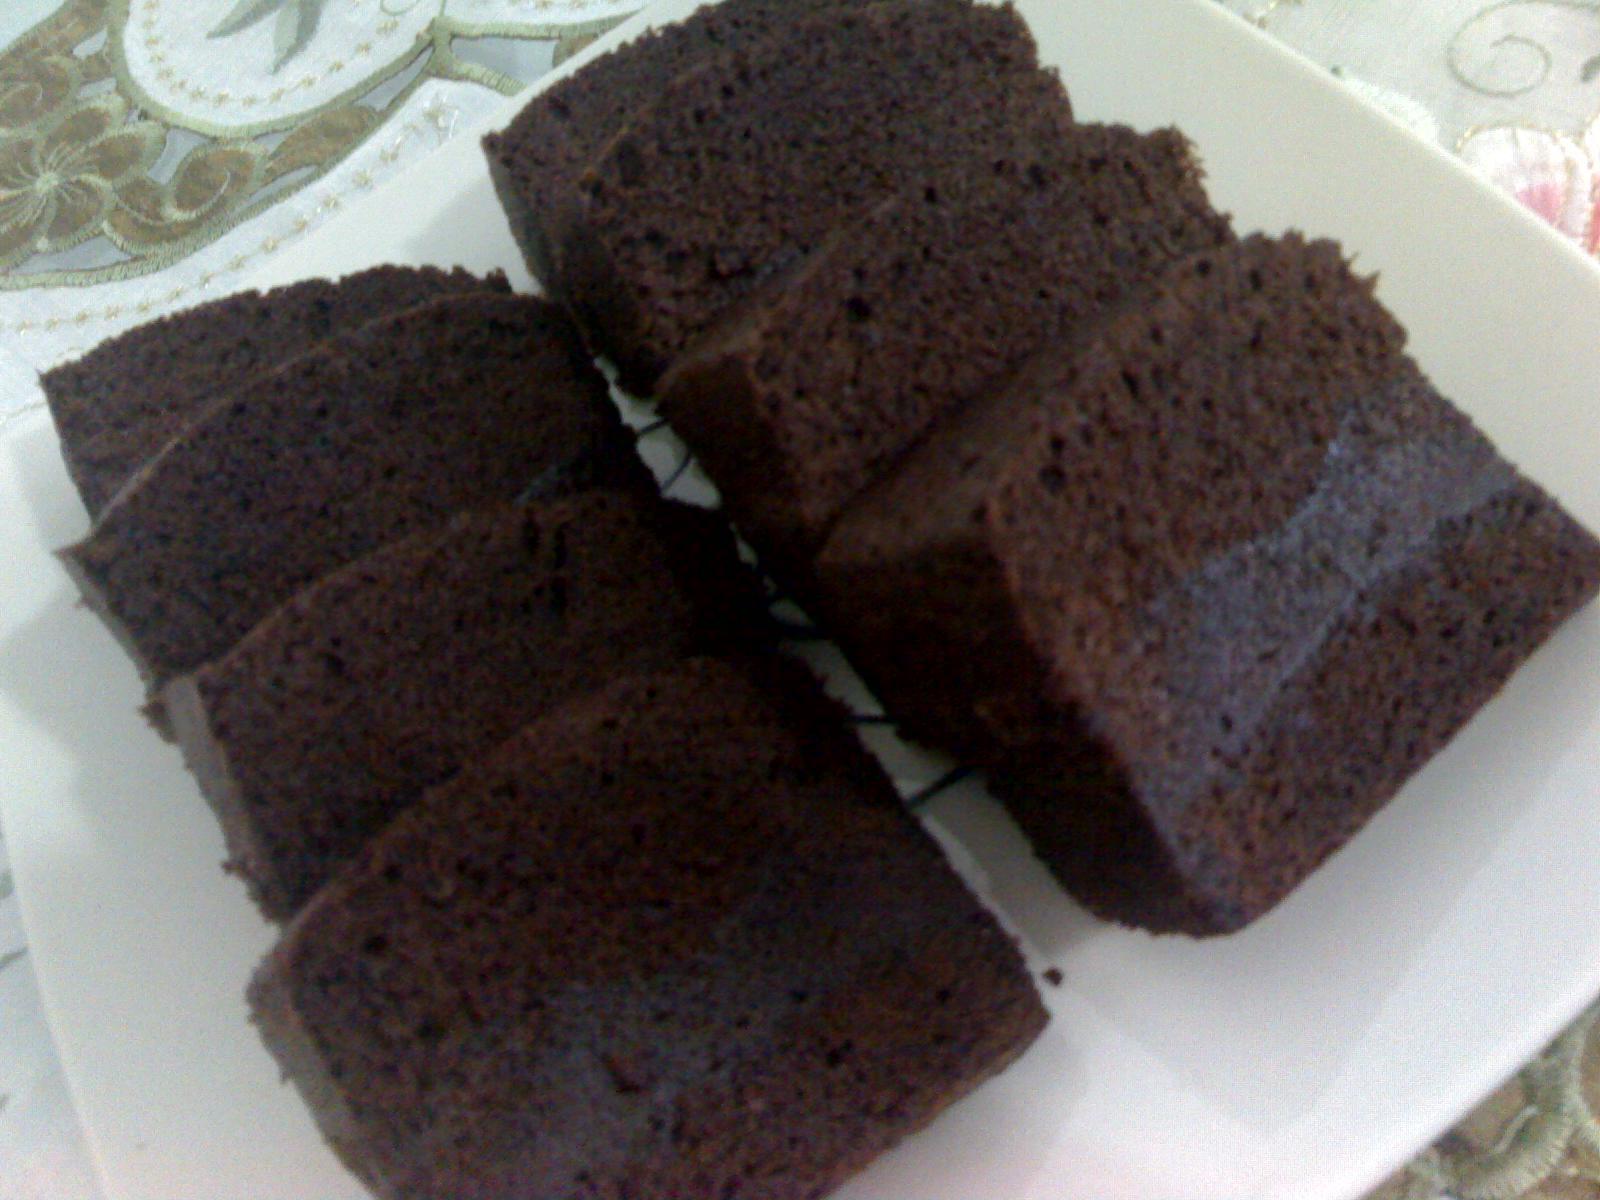 Resep Cake Kukus Lumer: Sip Dong!: Resep: Brownies Kukus Ala Amanda